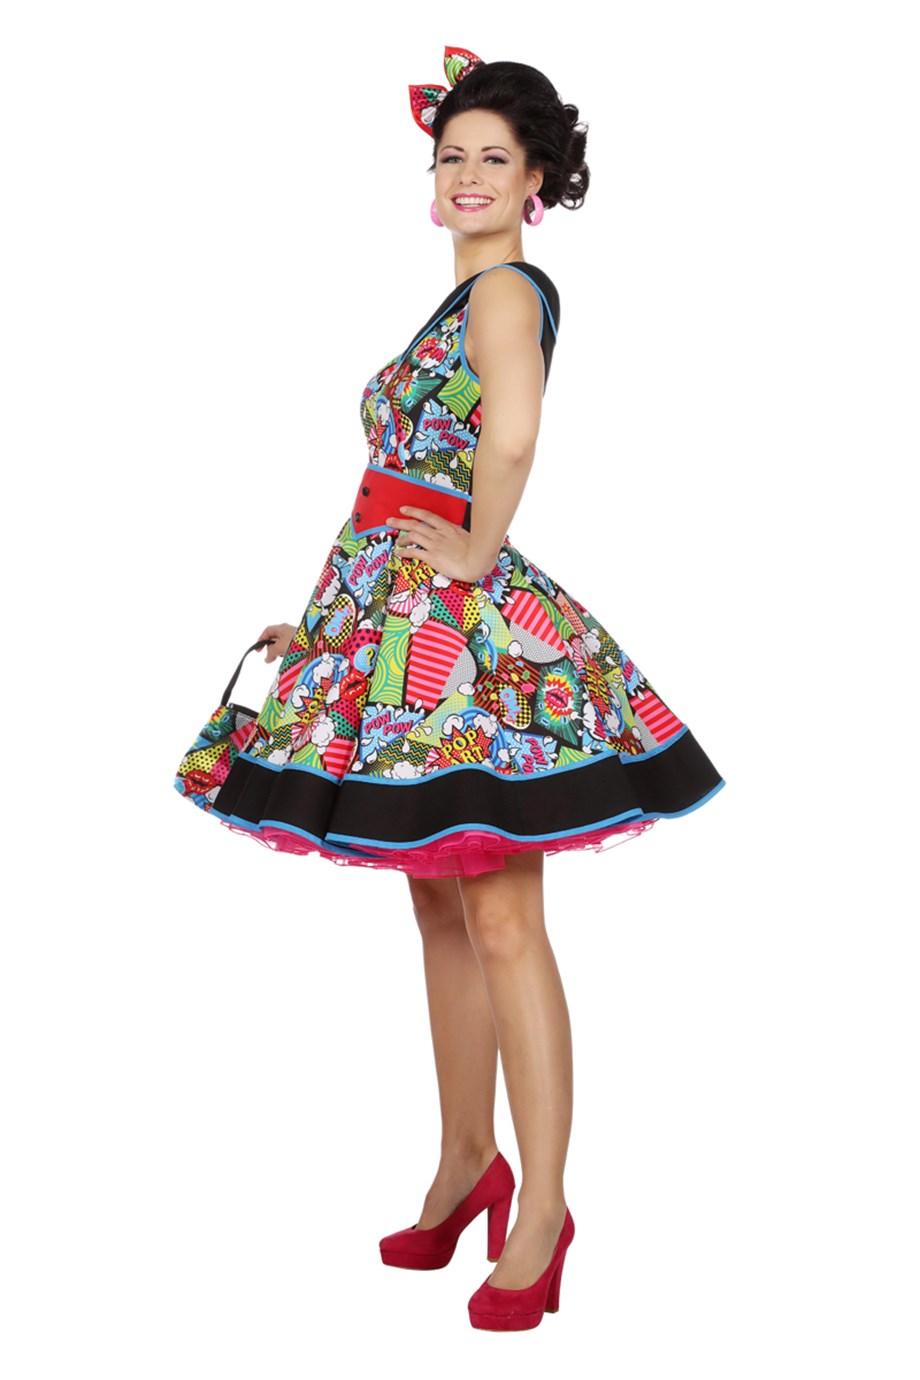 Damen Kleid Kostüm Pop Art 19er Jahre Fasching Gr. 19